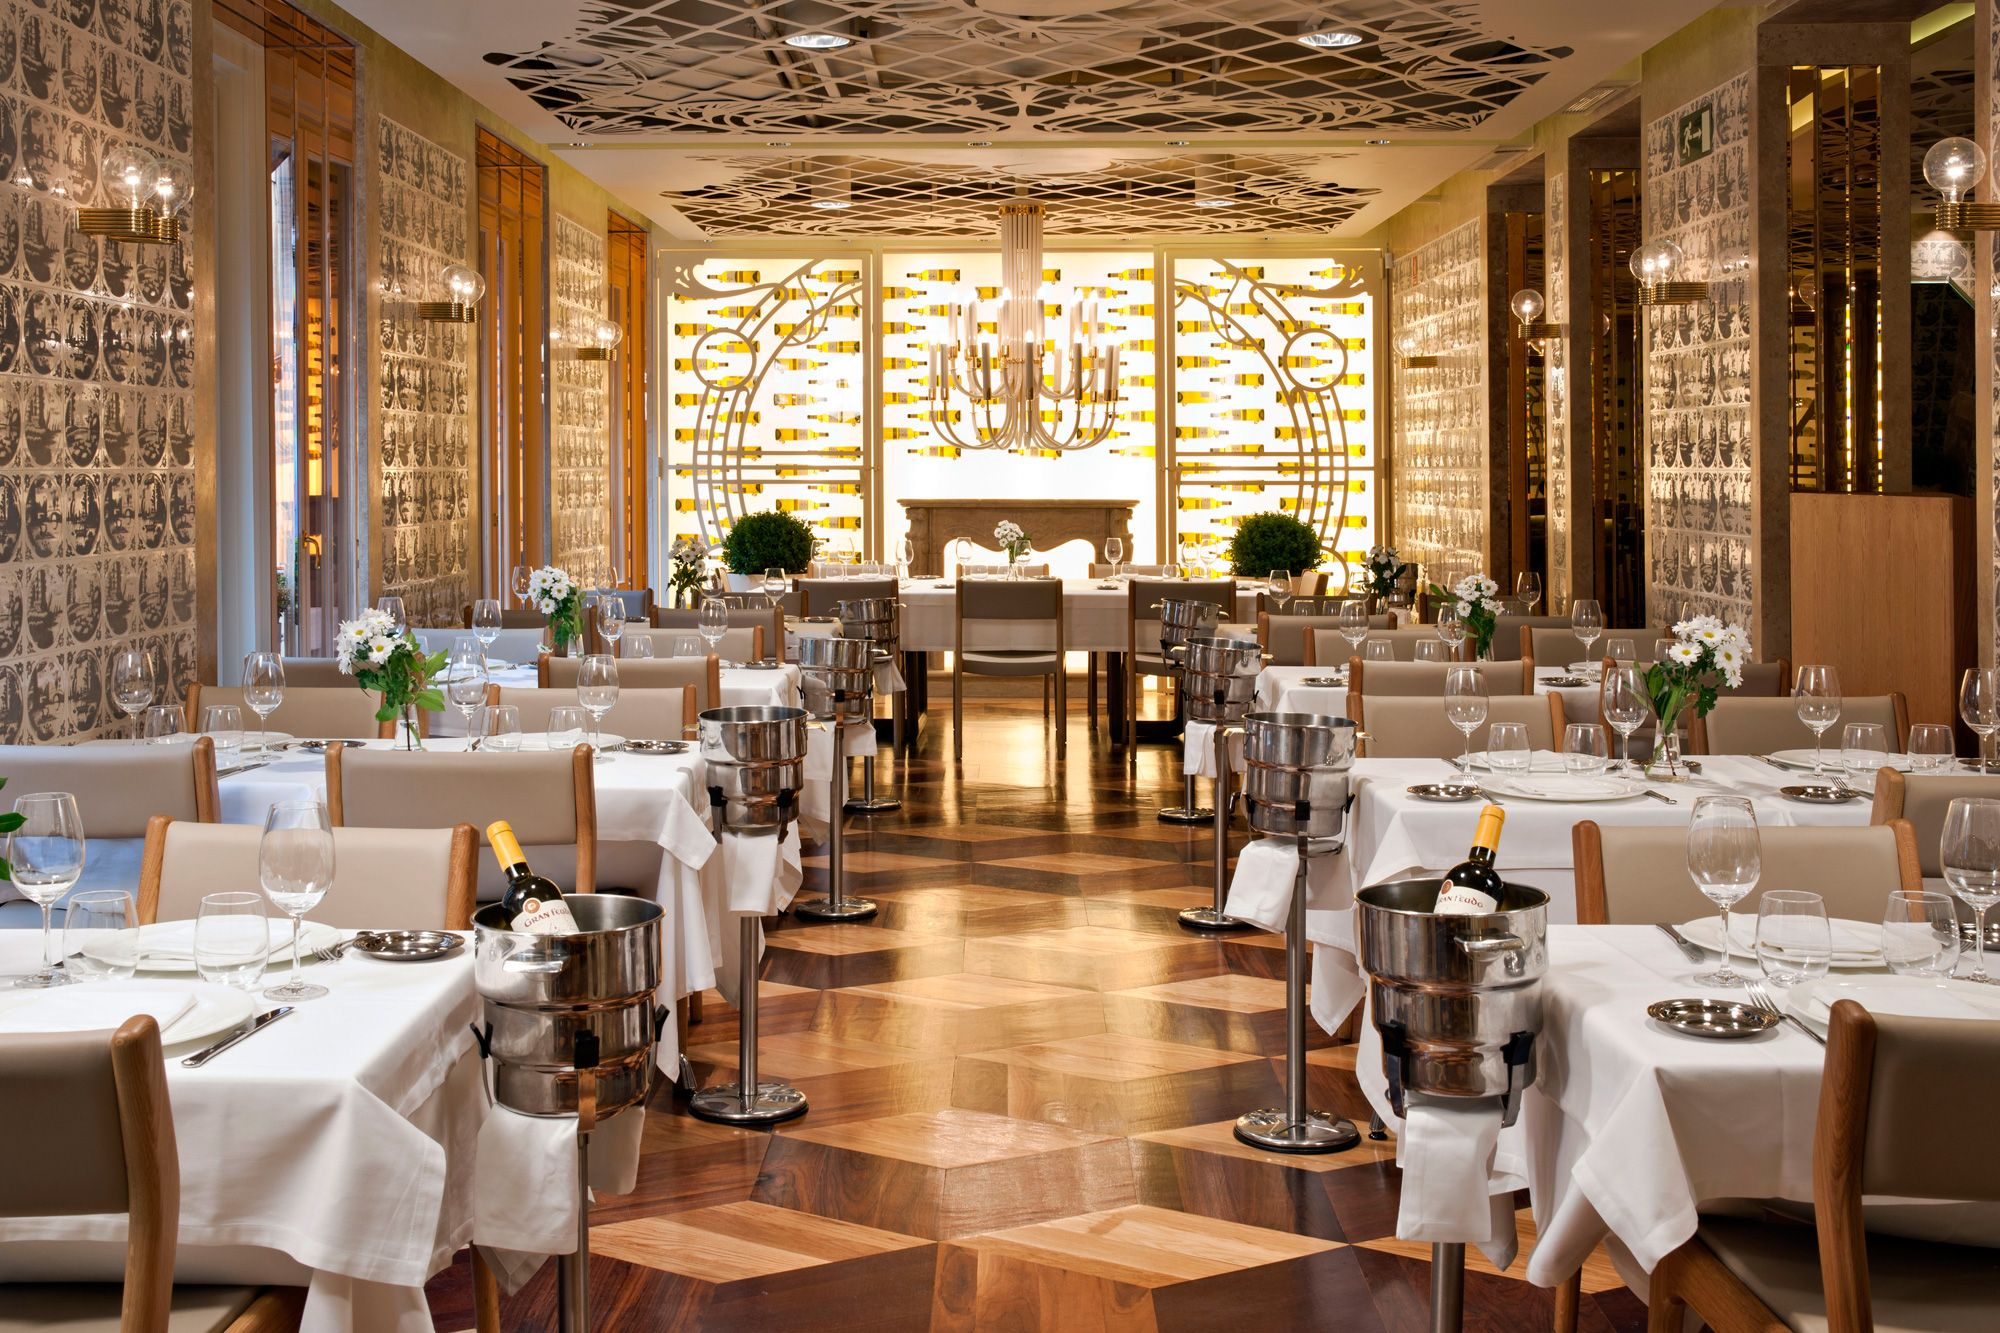 Fantastic restaurant interior decor art nouveau style for Diner style curtains